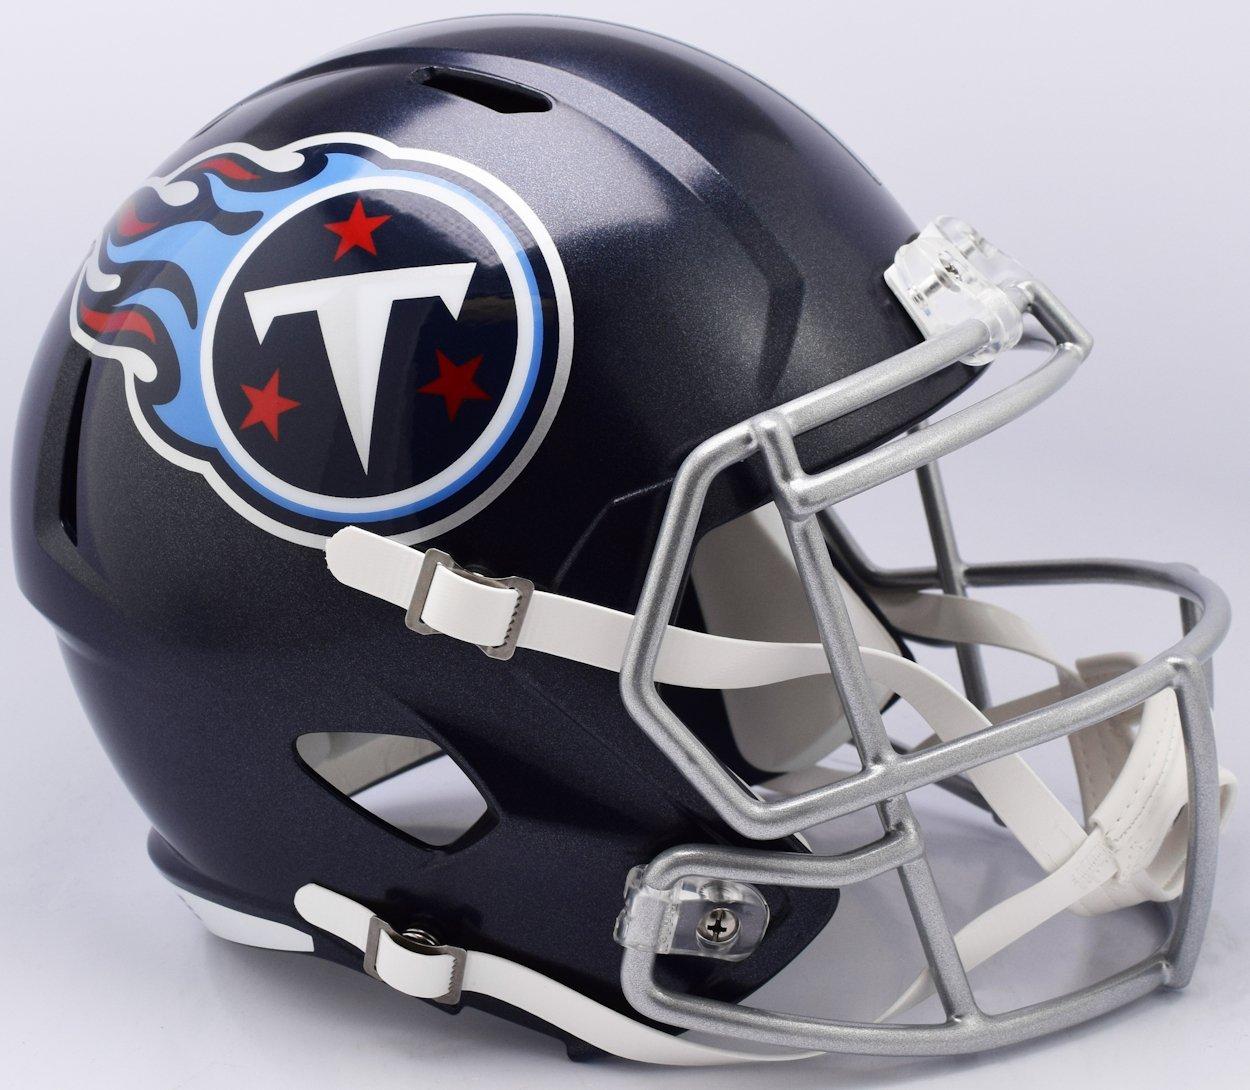 Tennessee Titans 2018 Logo Riddell Speed Mini Football Helmet New in Riddell Box